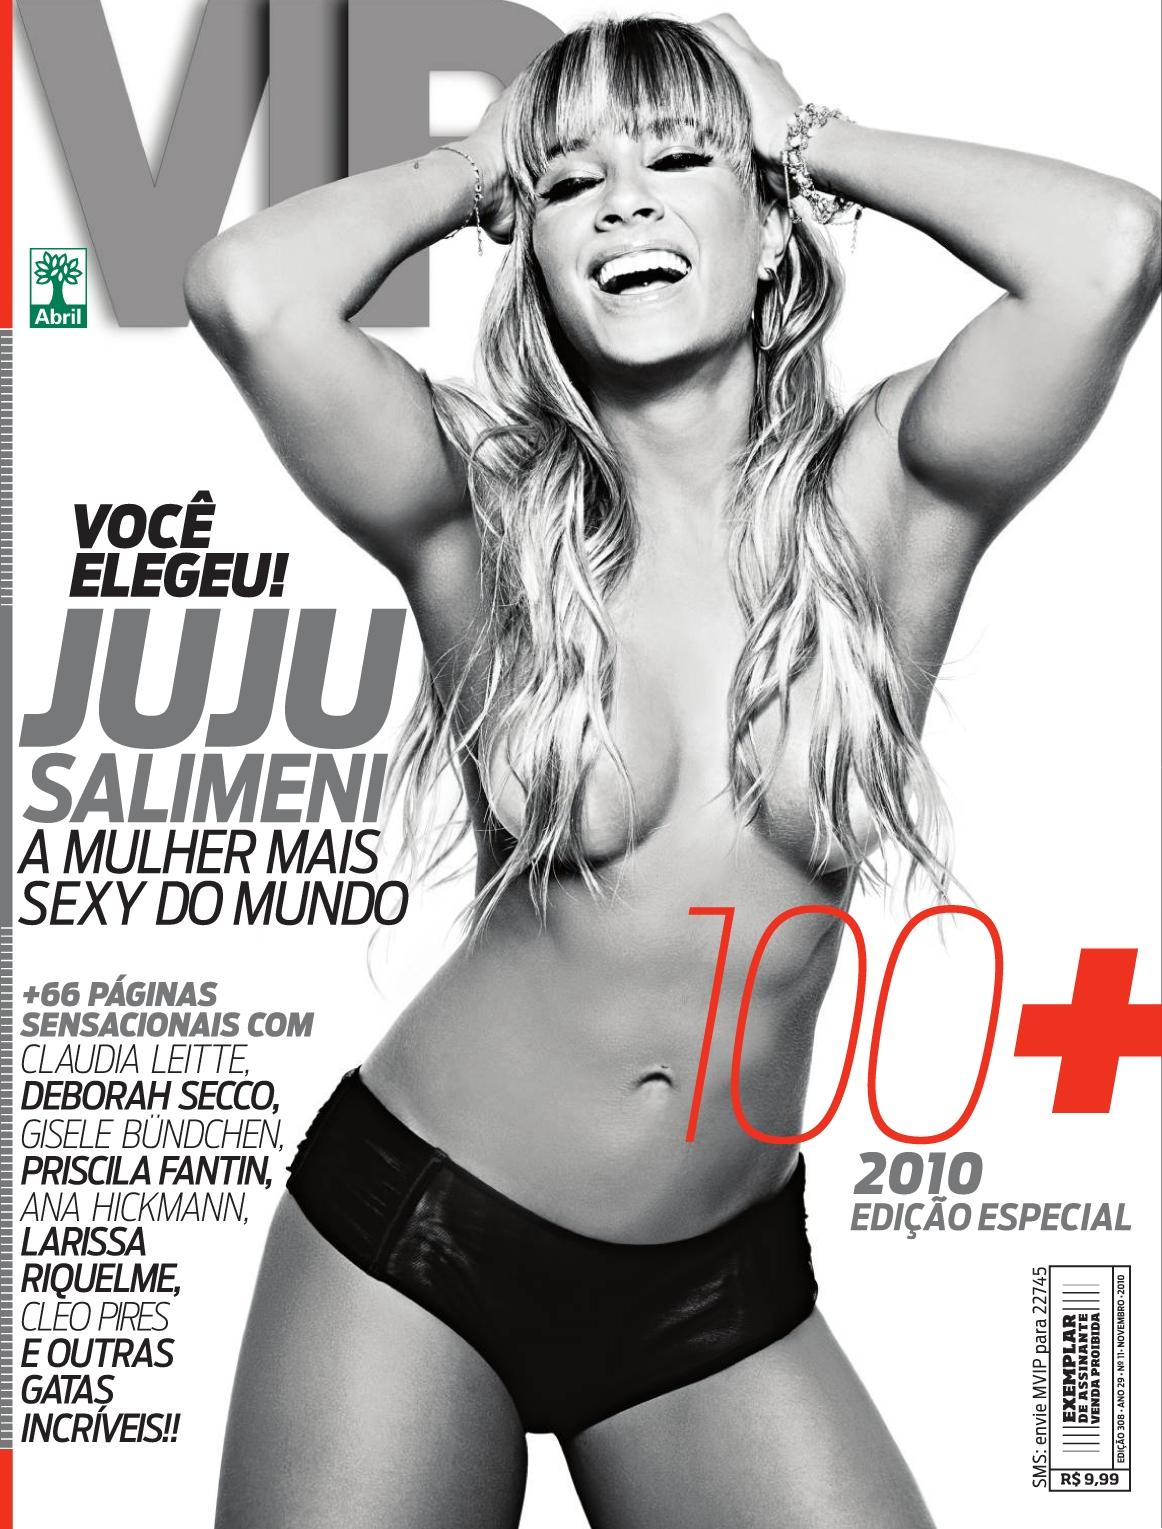 08616_Juliana_Salimeni_Revista_VIP_Noviembre_2010__BlogVen.net__1_123_436lo.jpg